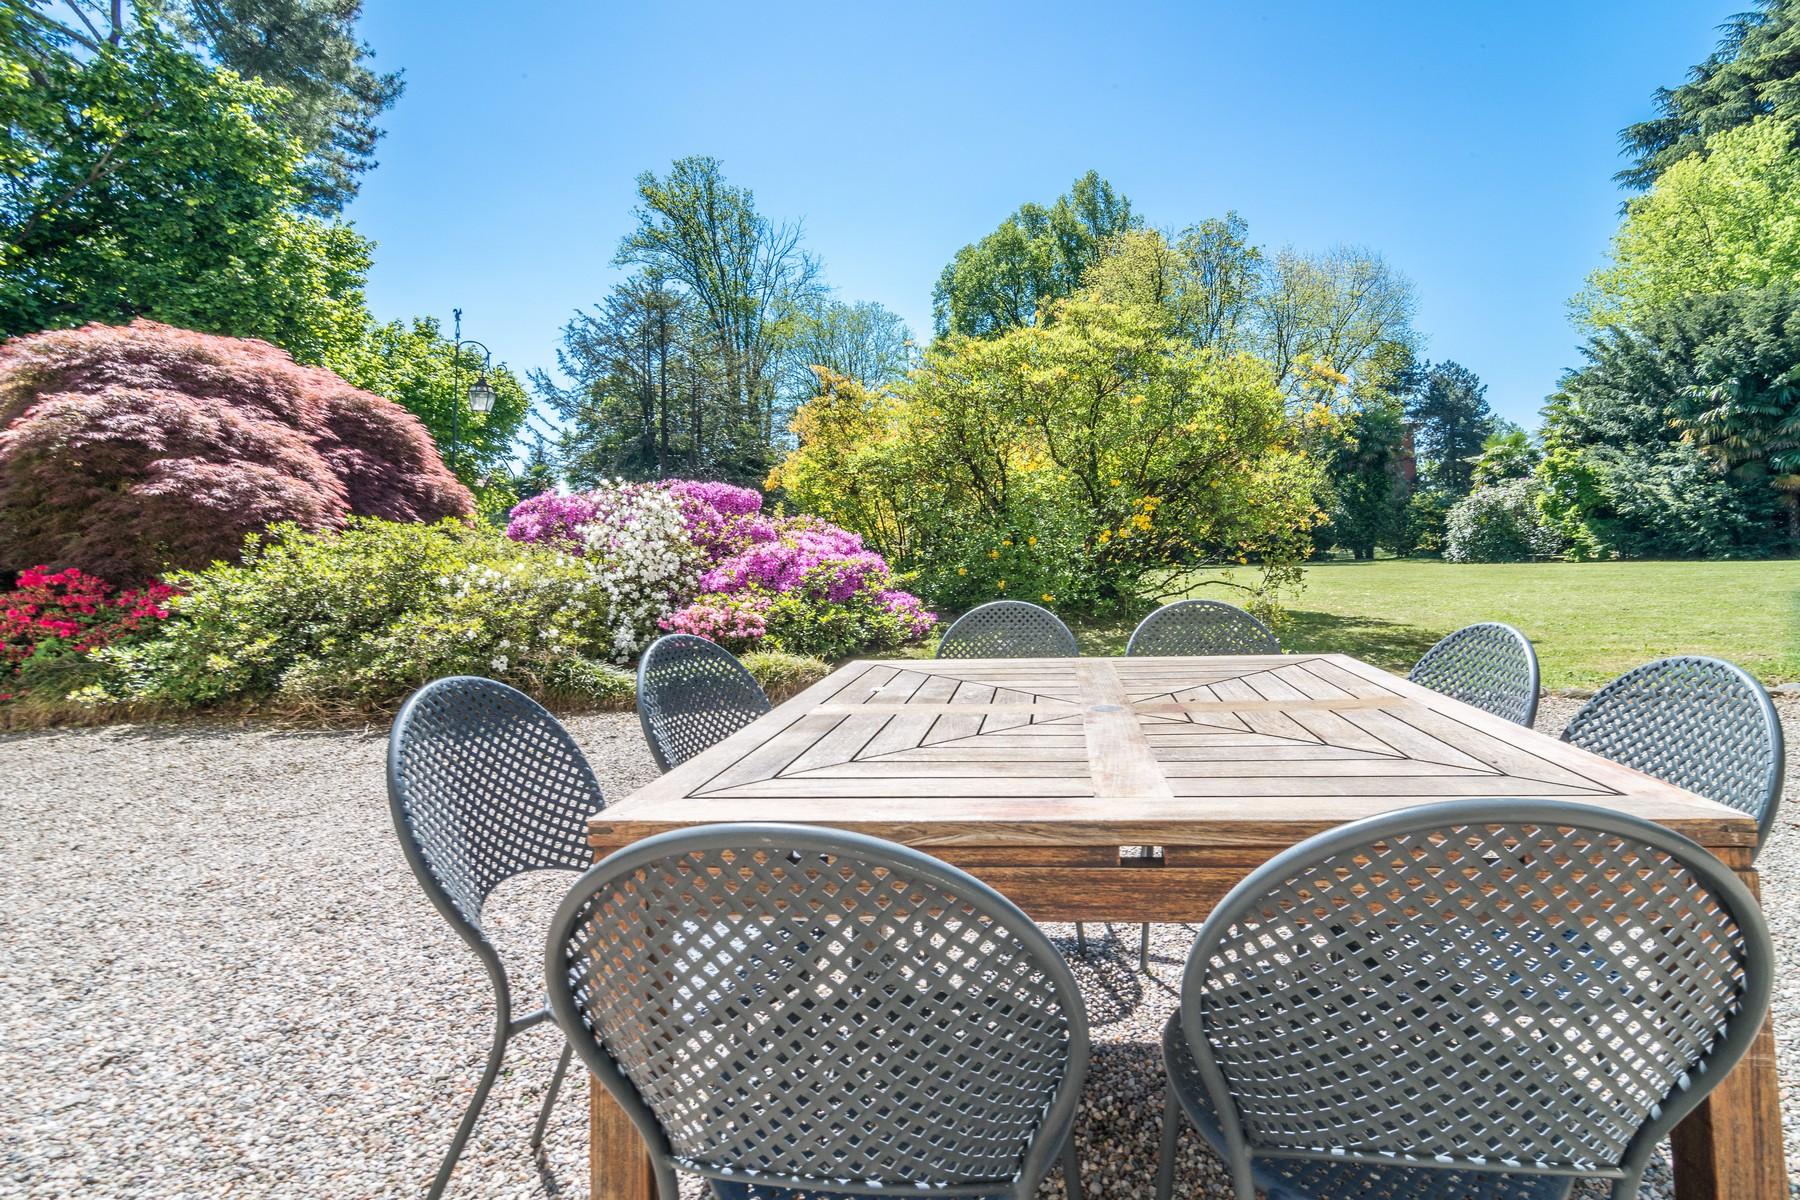 Villa in Vendita a Varese: 5 locali, 1500 mq - Foto 13